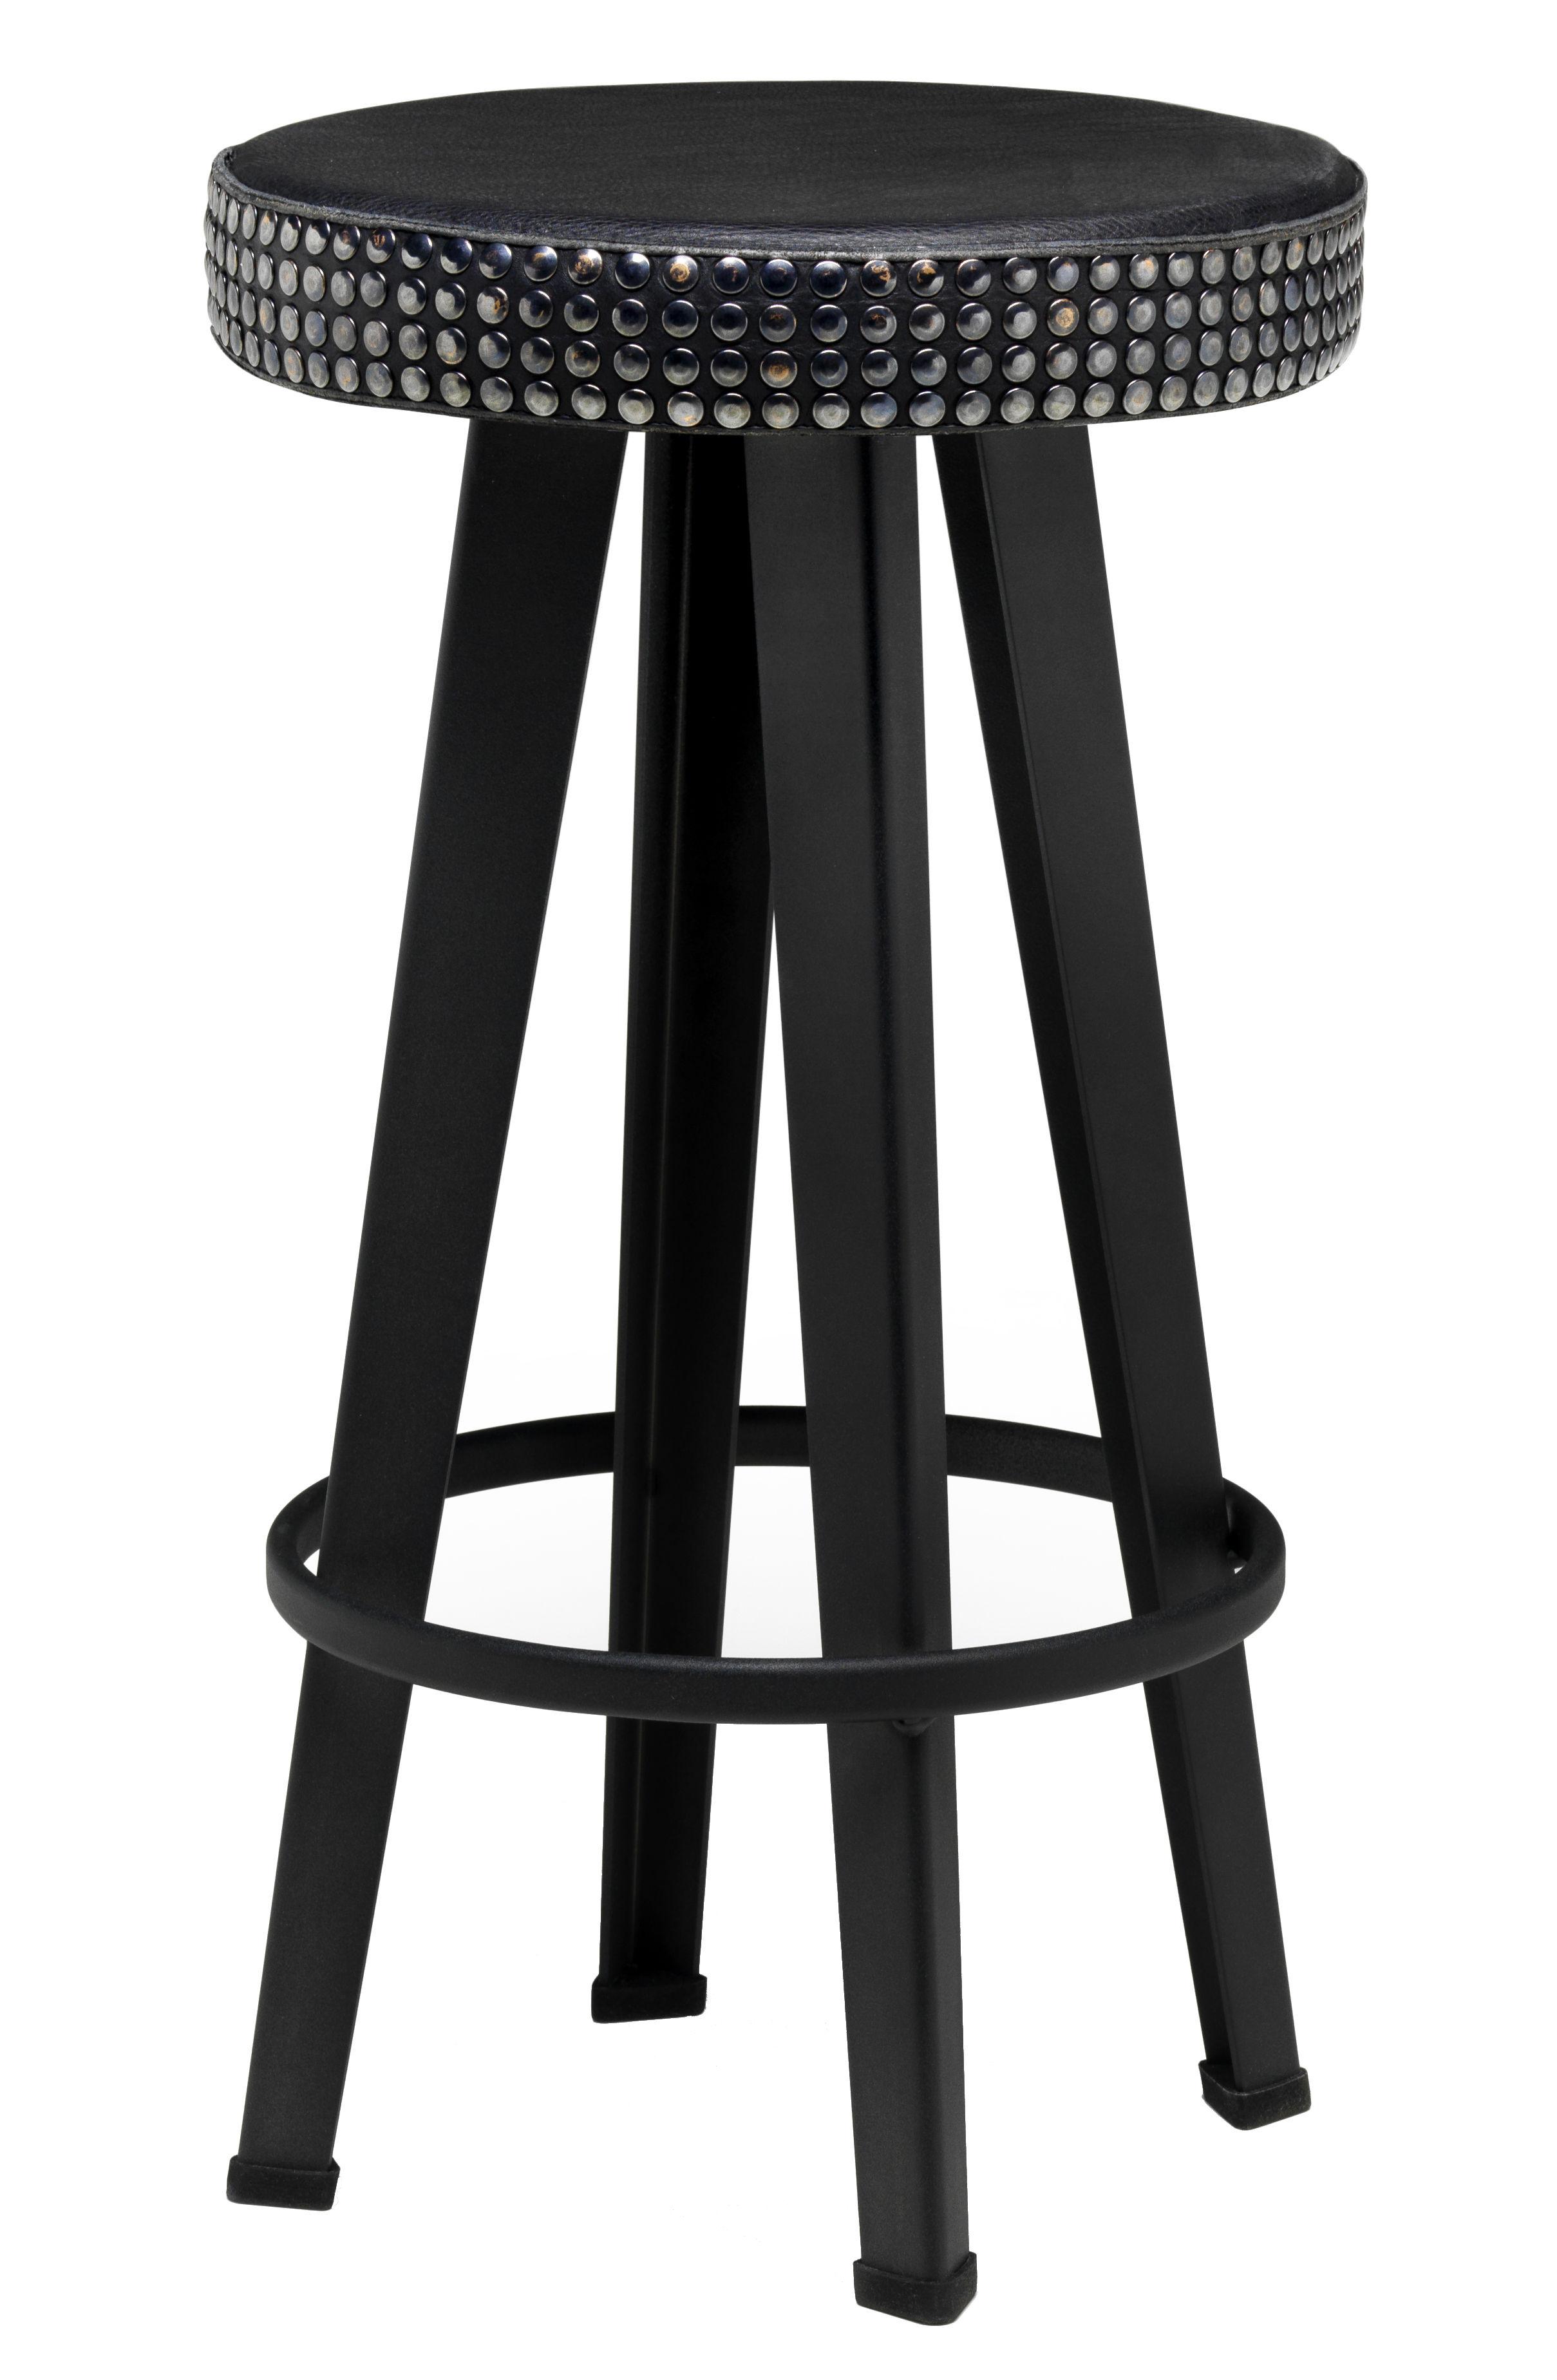 tabouret de bar bar stud h 63 cm assise rembourr e cuir m tal noir diesel with moroso. Black Bedroom Furniture Sets. Home Design Ideas